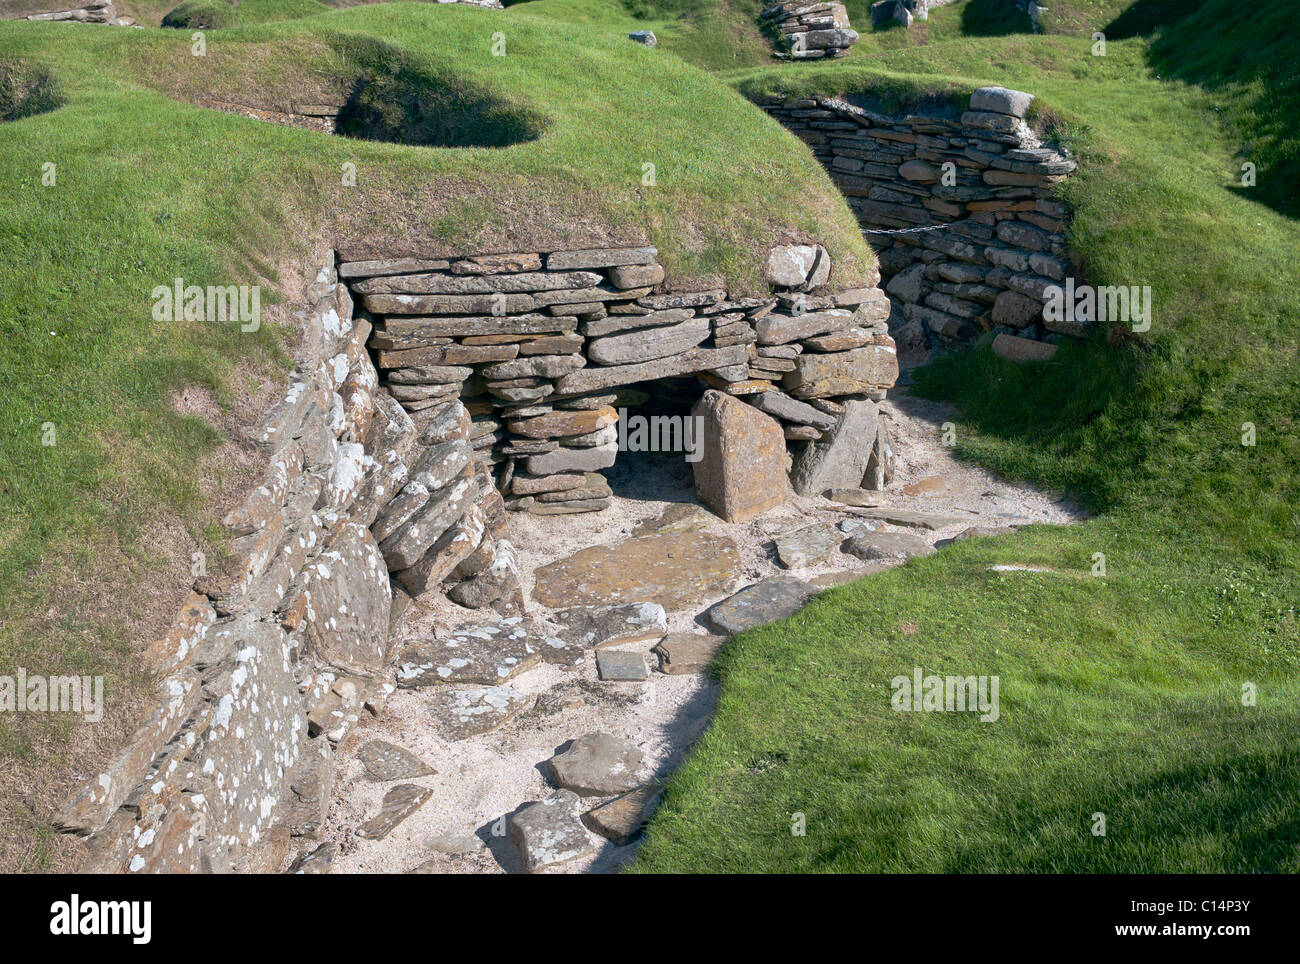 SKARA BRAE ORKNEY ISLANDS SCOTLAND UNITED KINGDOM - Stock Image